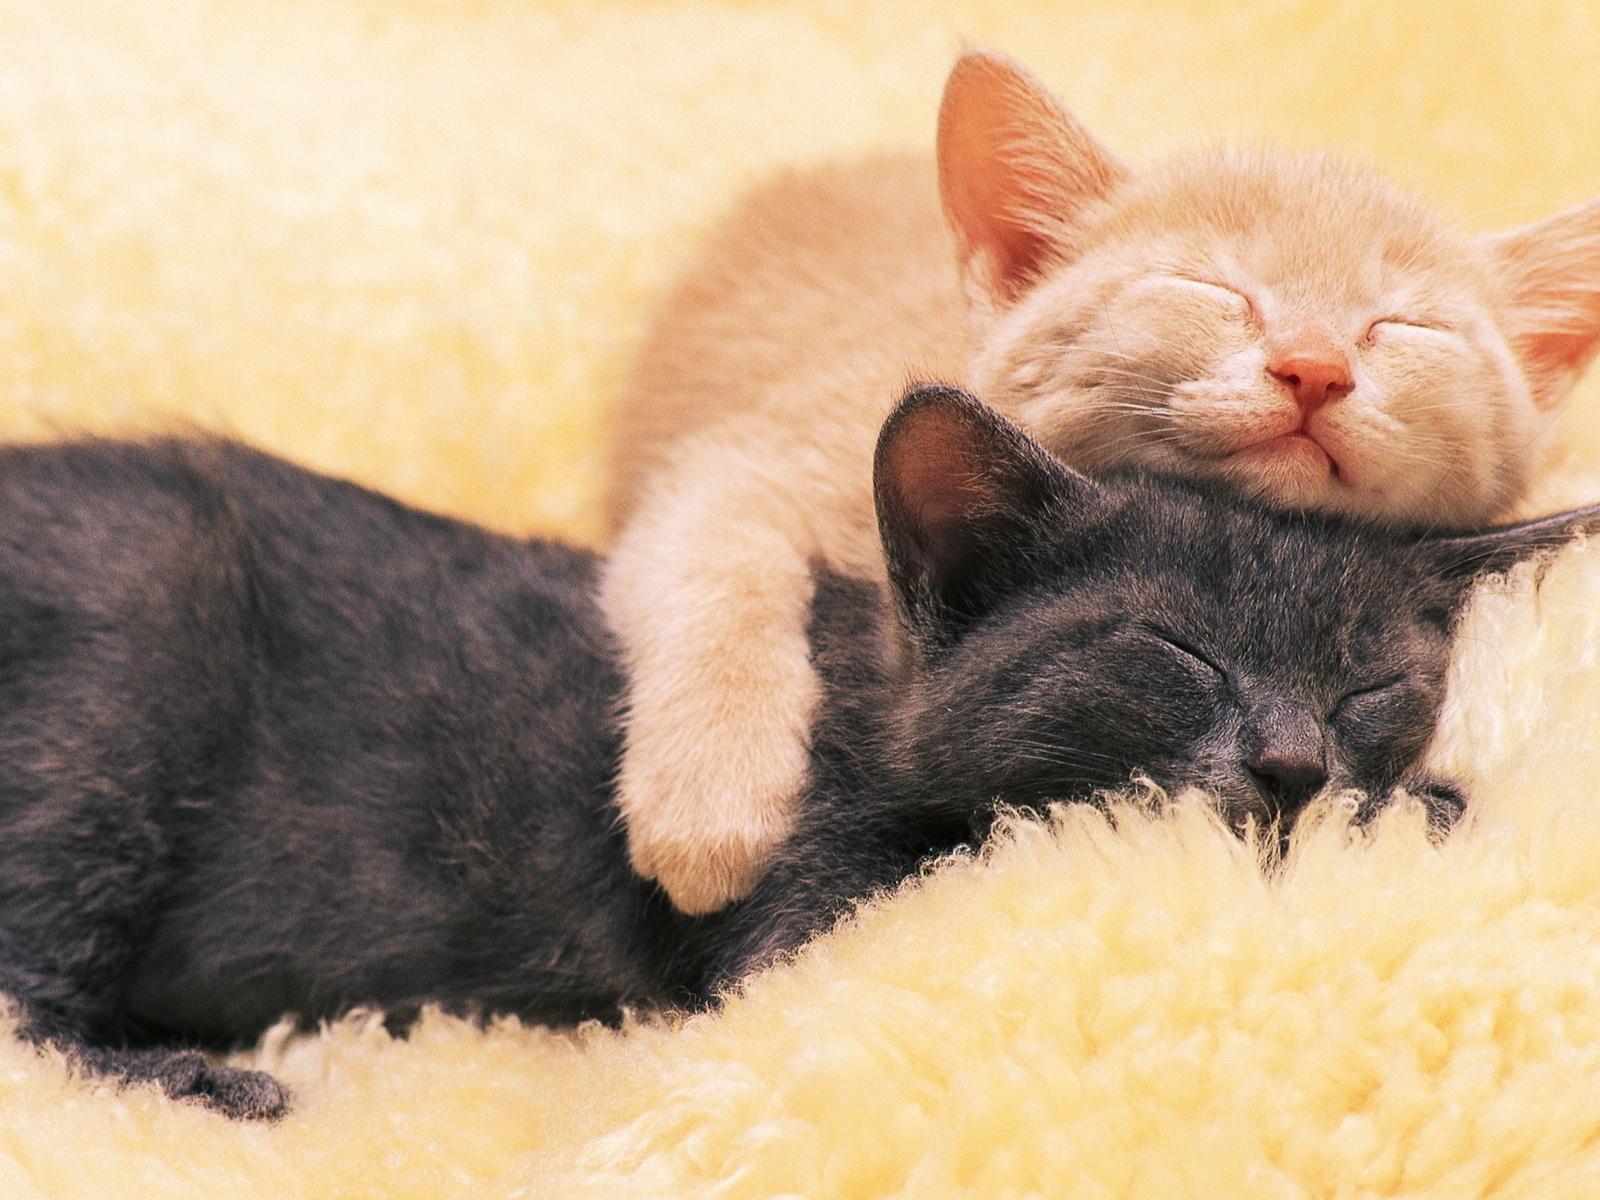 fotos de dos gatos abrazados para facebook ~ Mejores Fotos del ...